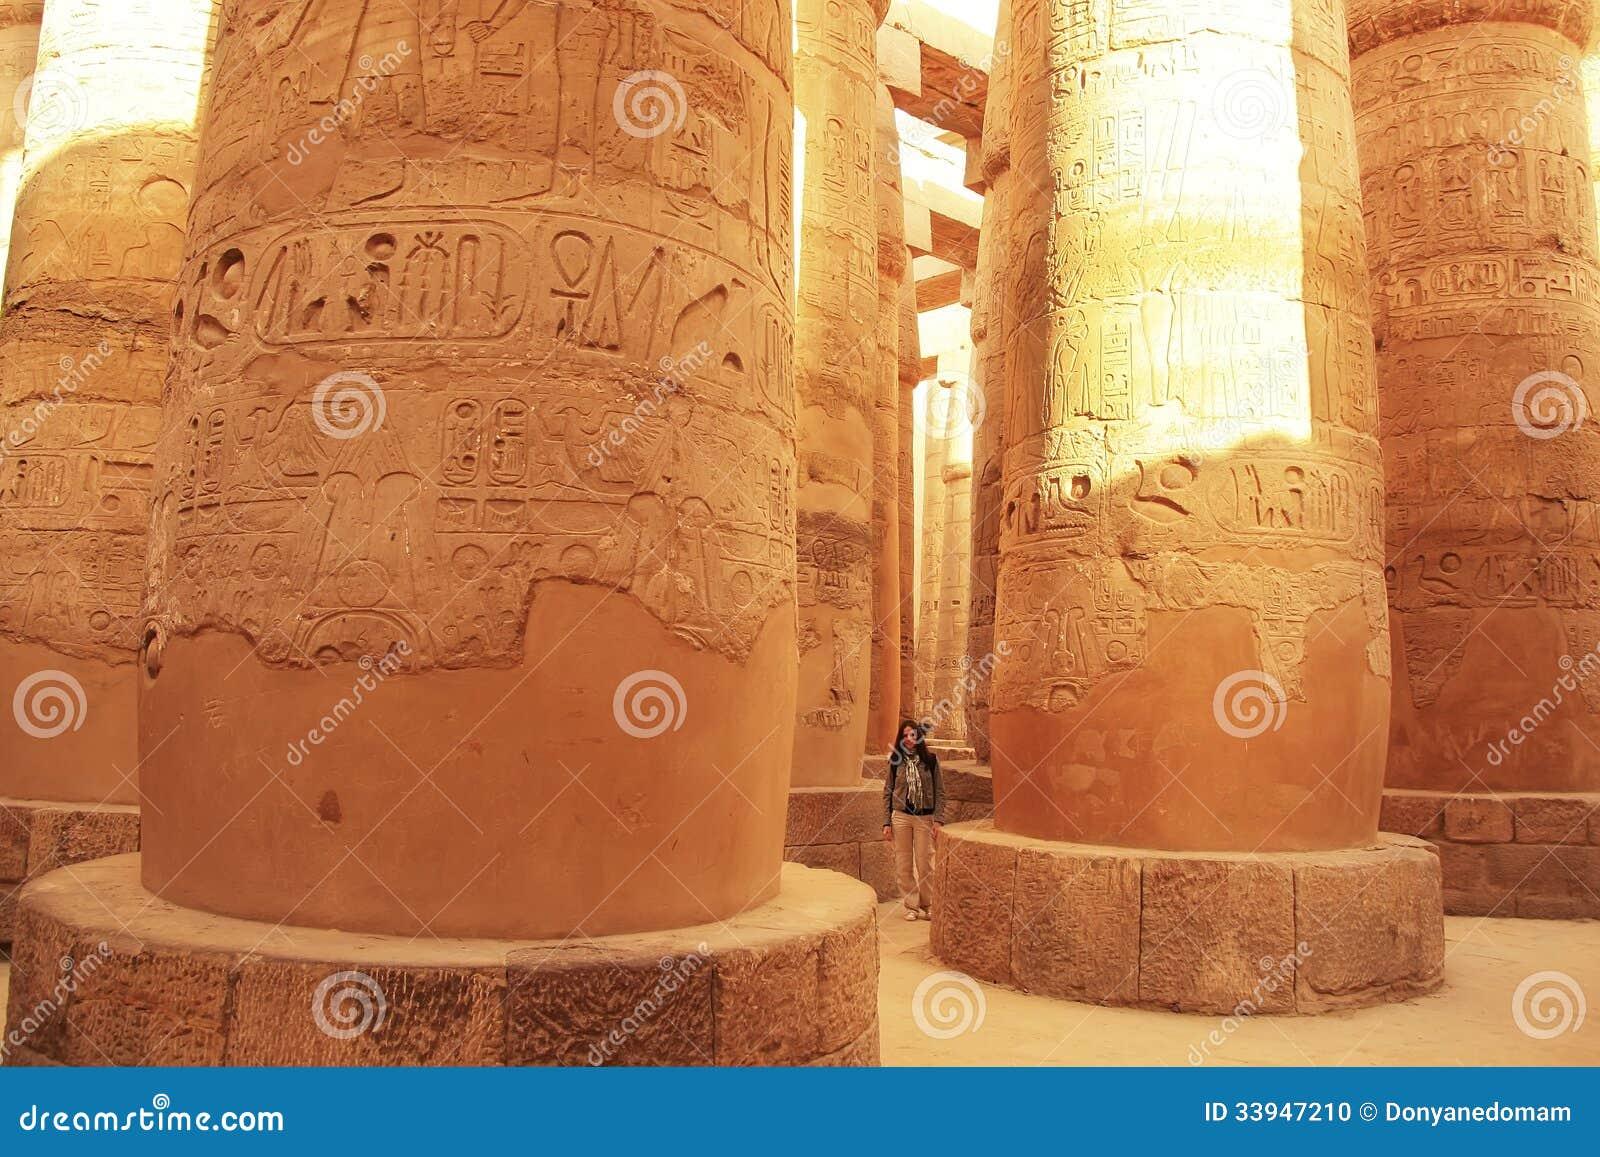 Great Hypostyle Hall, Karnak temple complex, Luxor